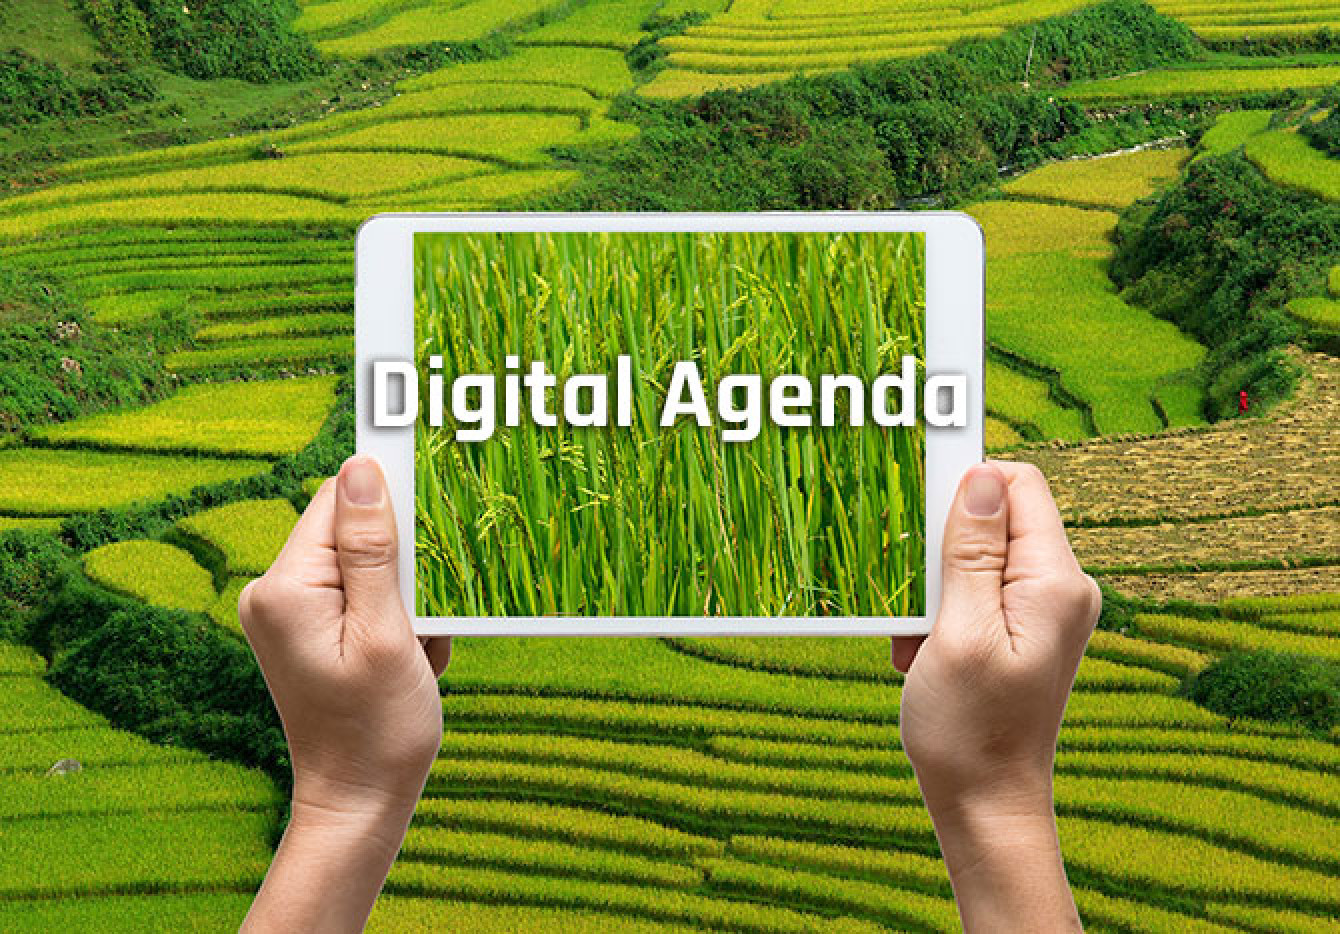 Digital_agenda.jpg